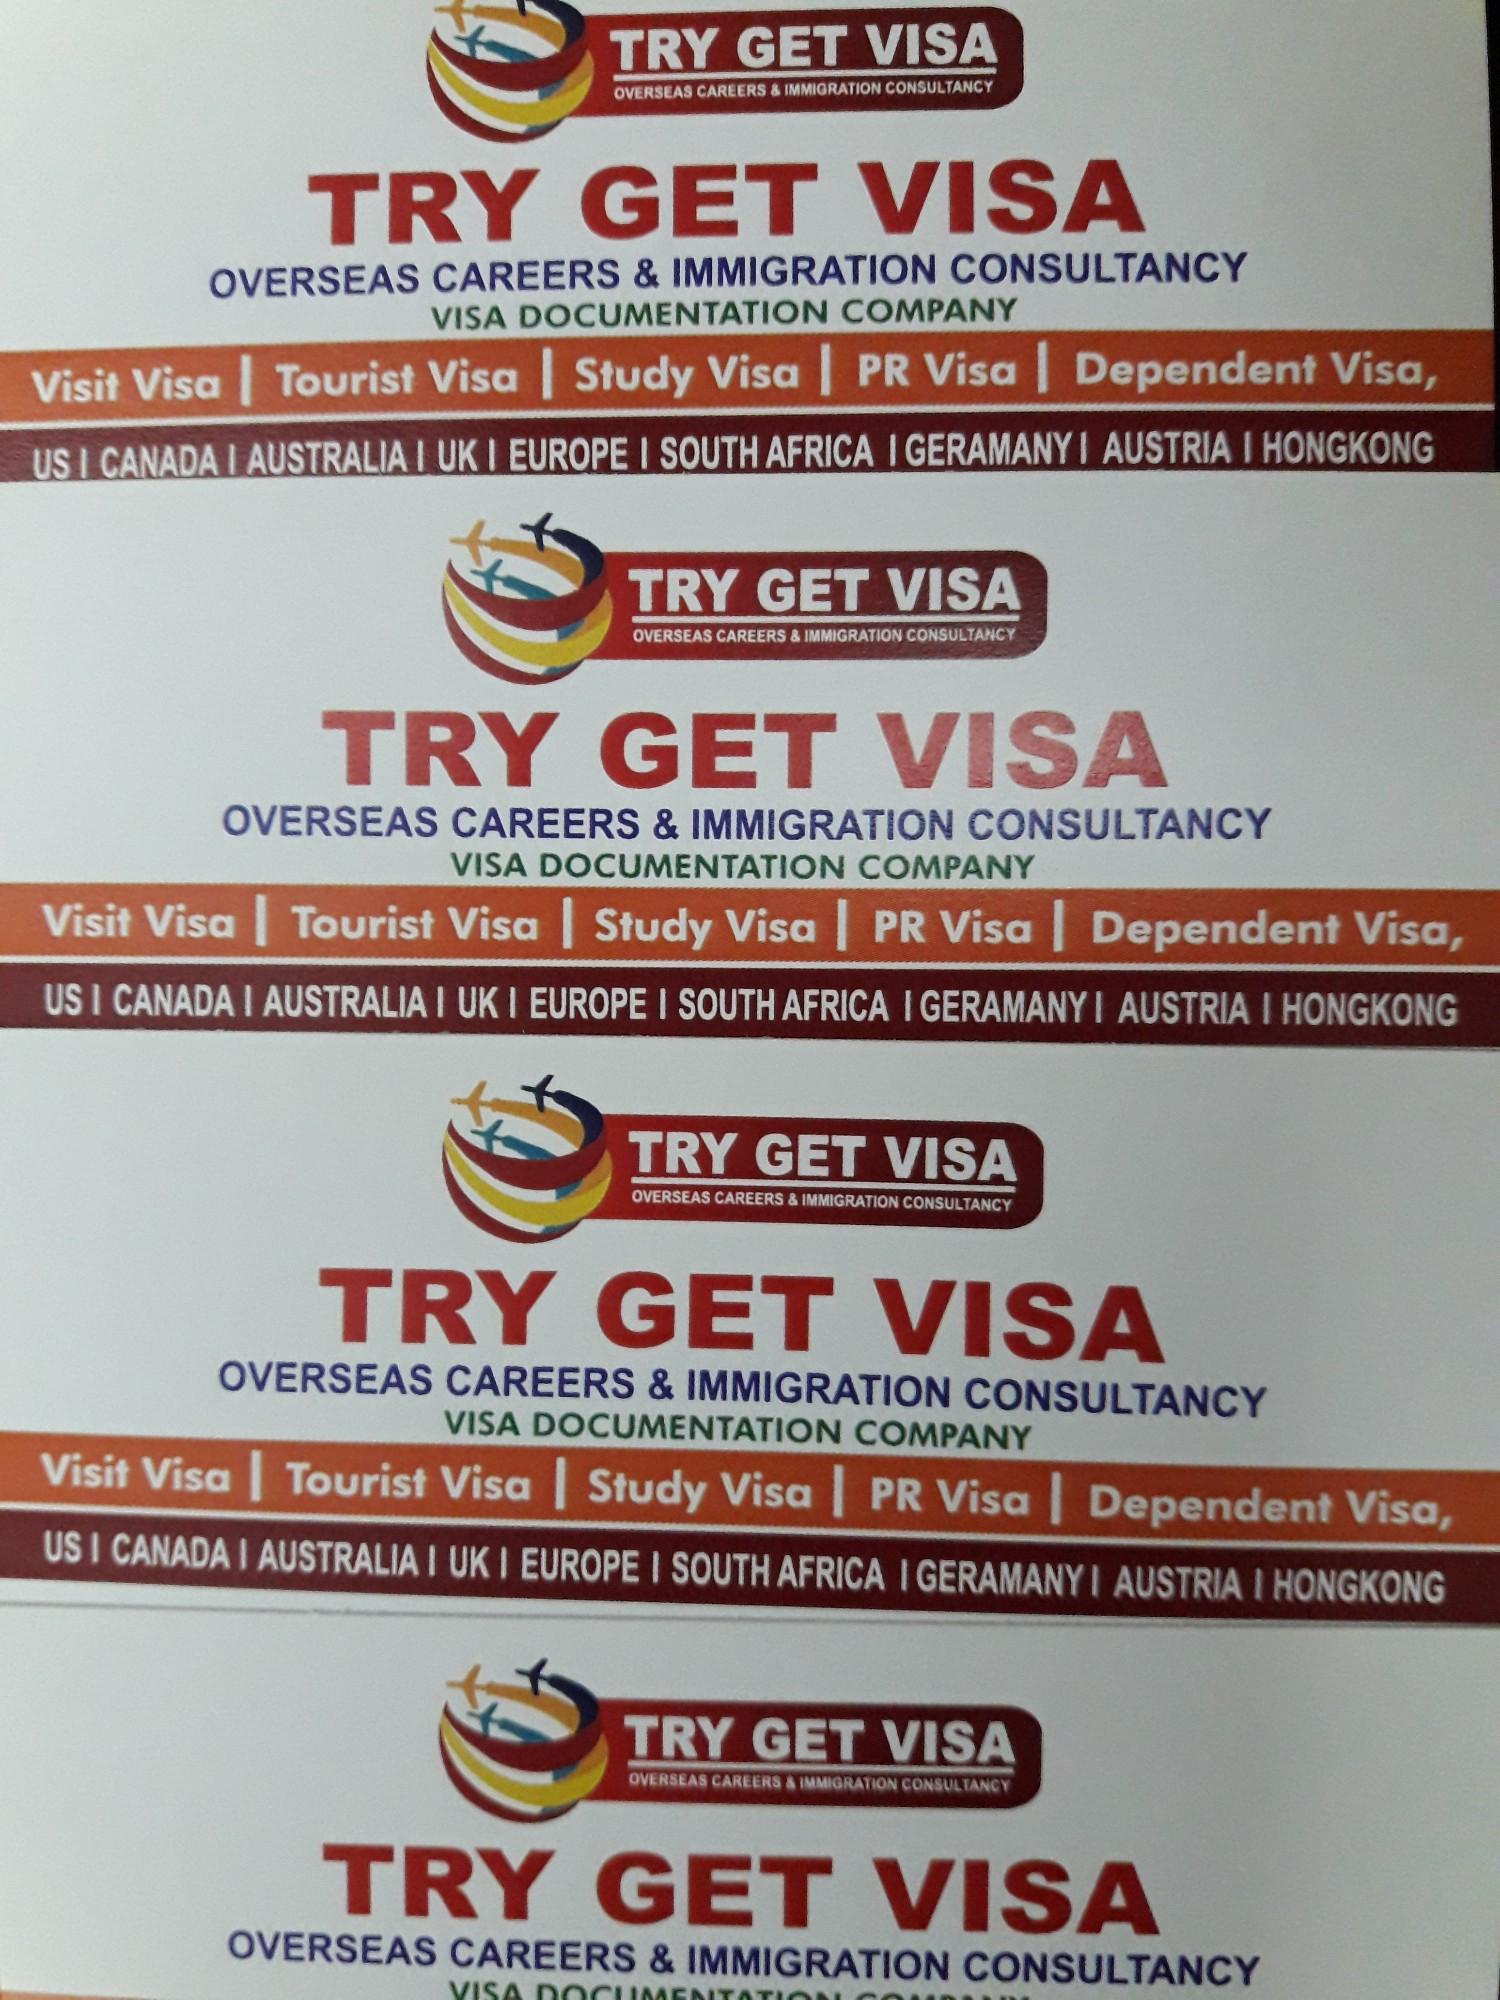 Try Get Visa Overseas Career & Immigration Consultancy in Abids